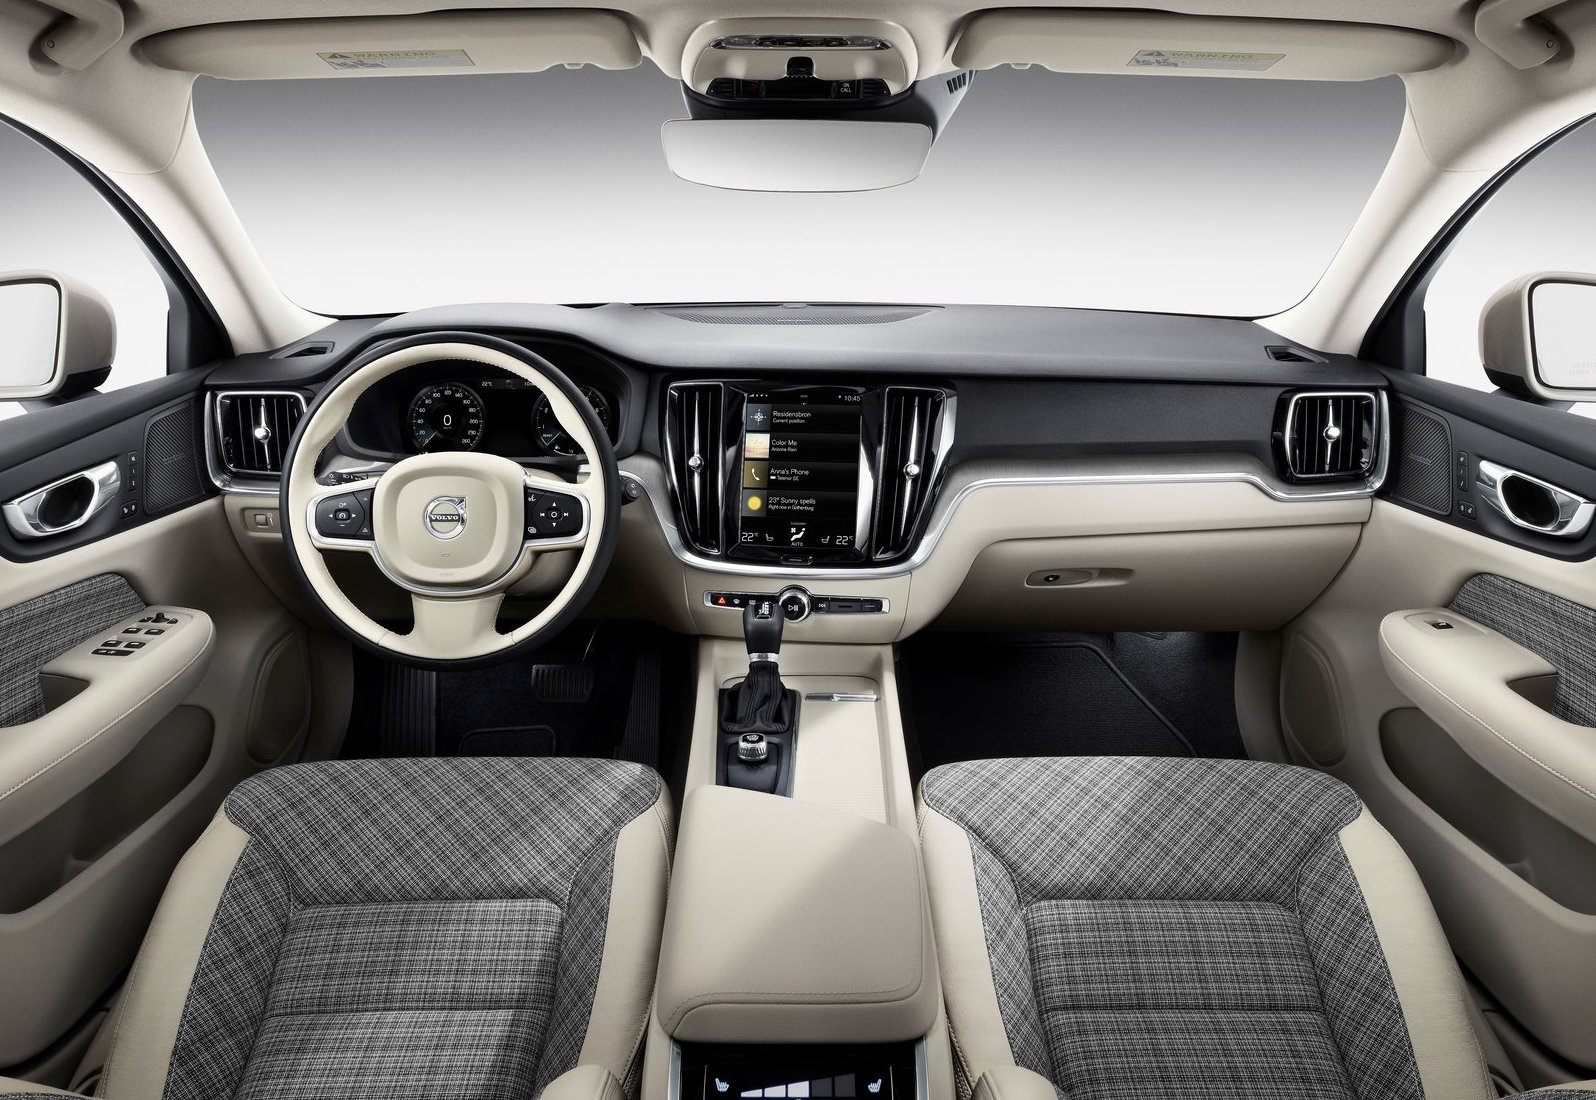 2019 Volvo V60 getting cool plaid textile interior trim option